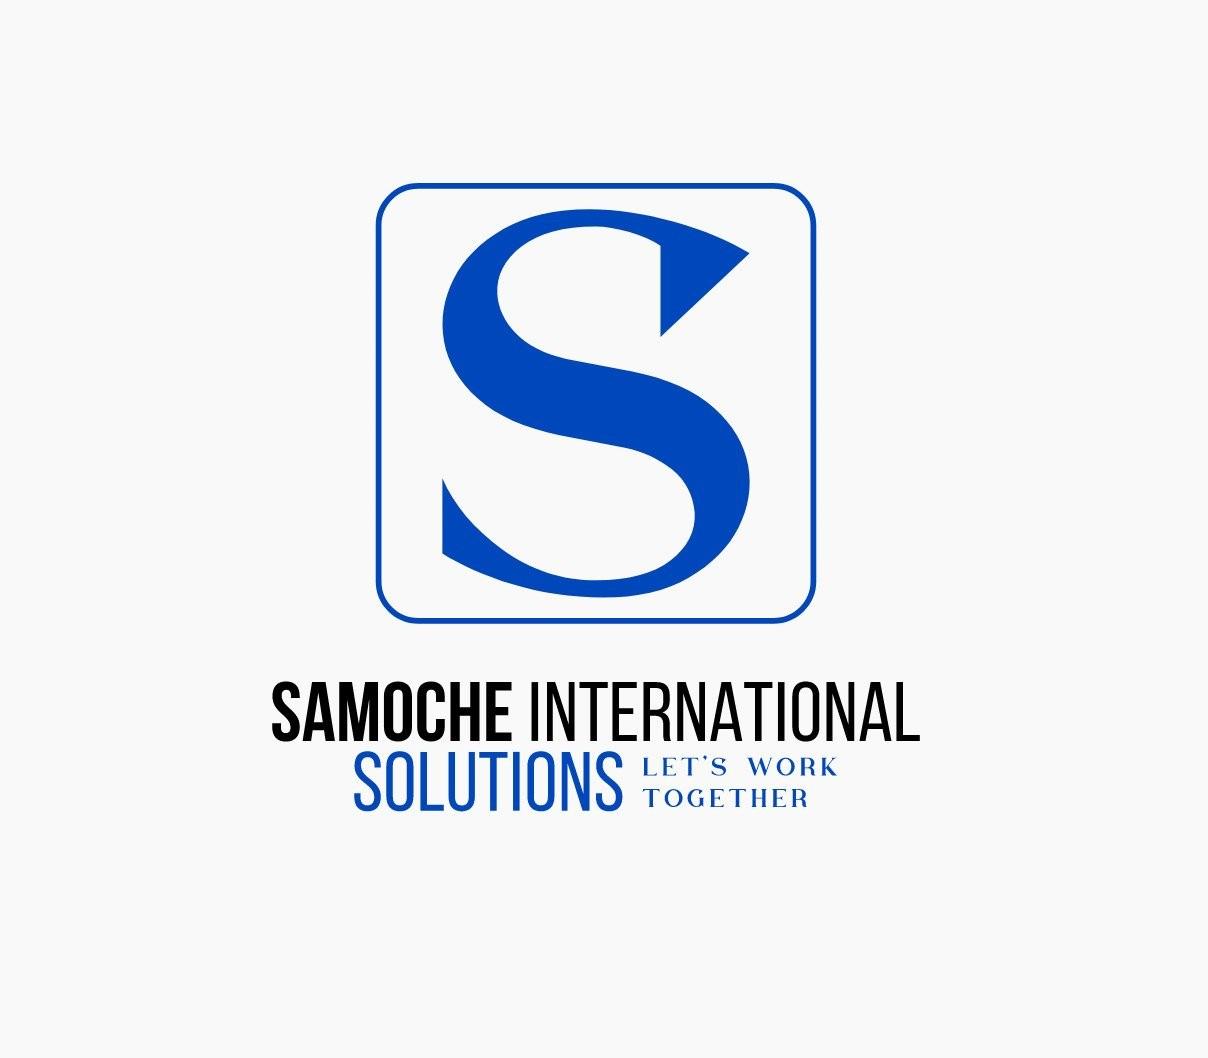 SAMOCHE INTERNATIONAL SOLUTIONS